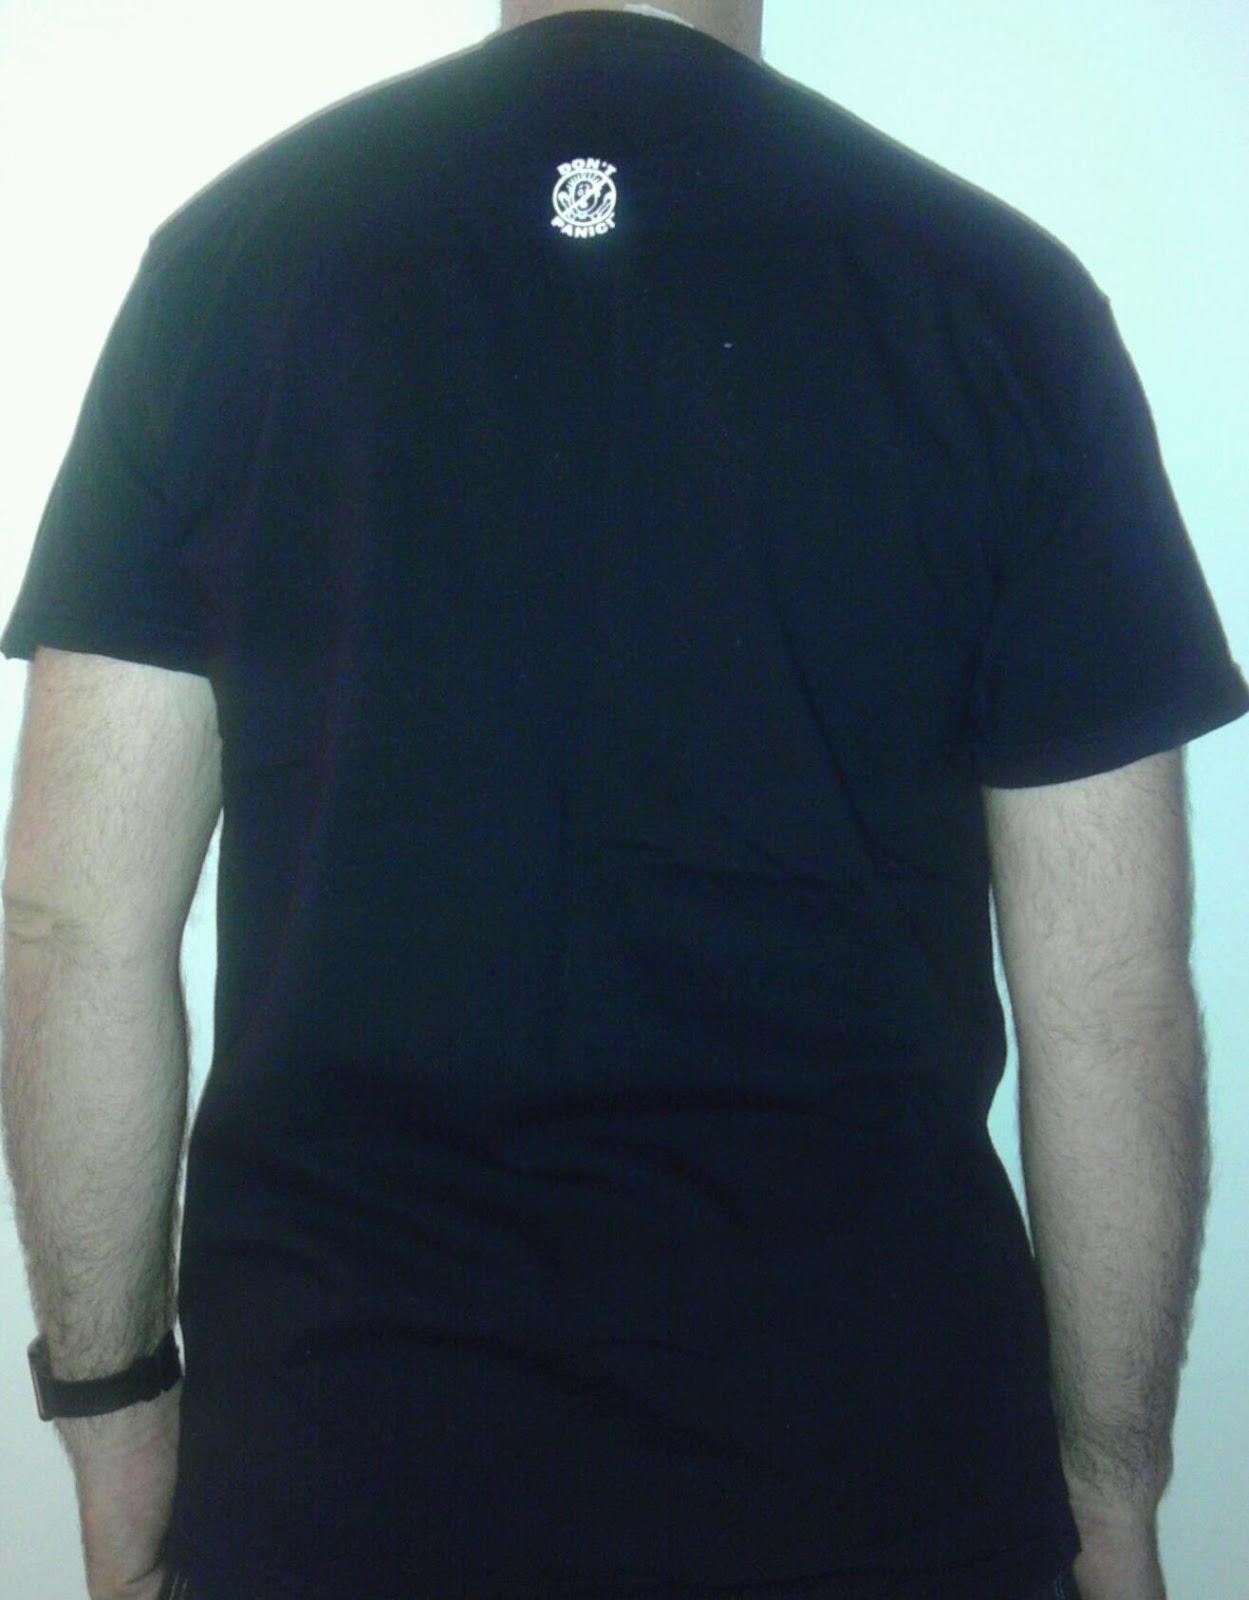 T-shirt Da Uomo Nato a un Rave Discoteca Retrò Compleanno Novità TEE T-shirt T-shirt